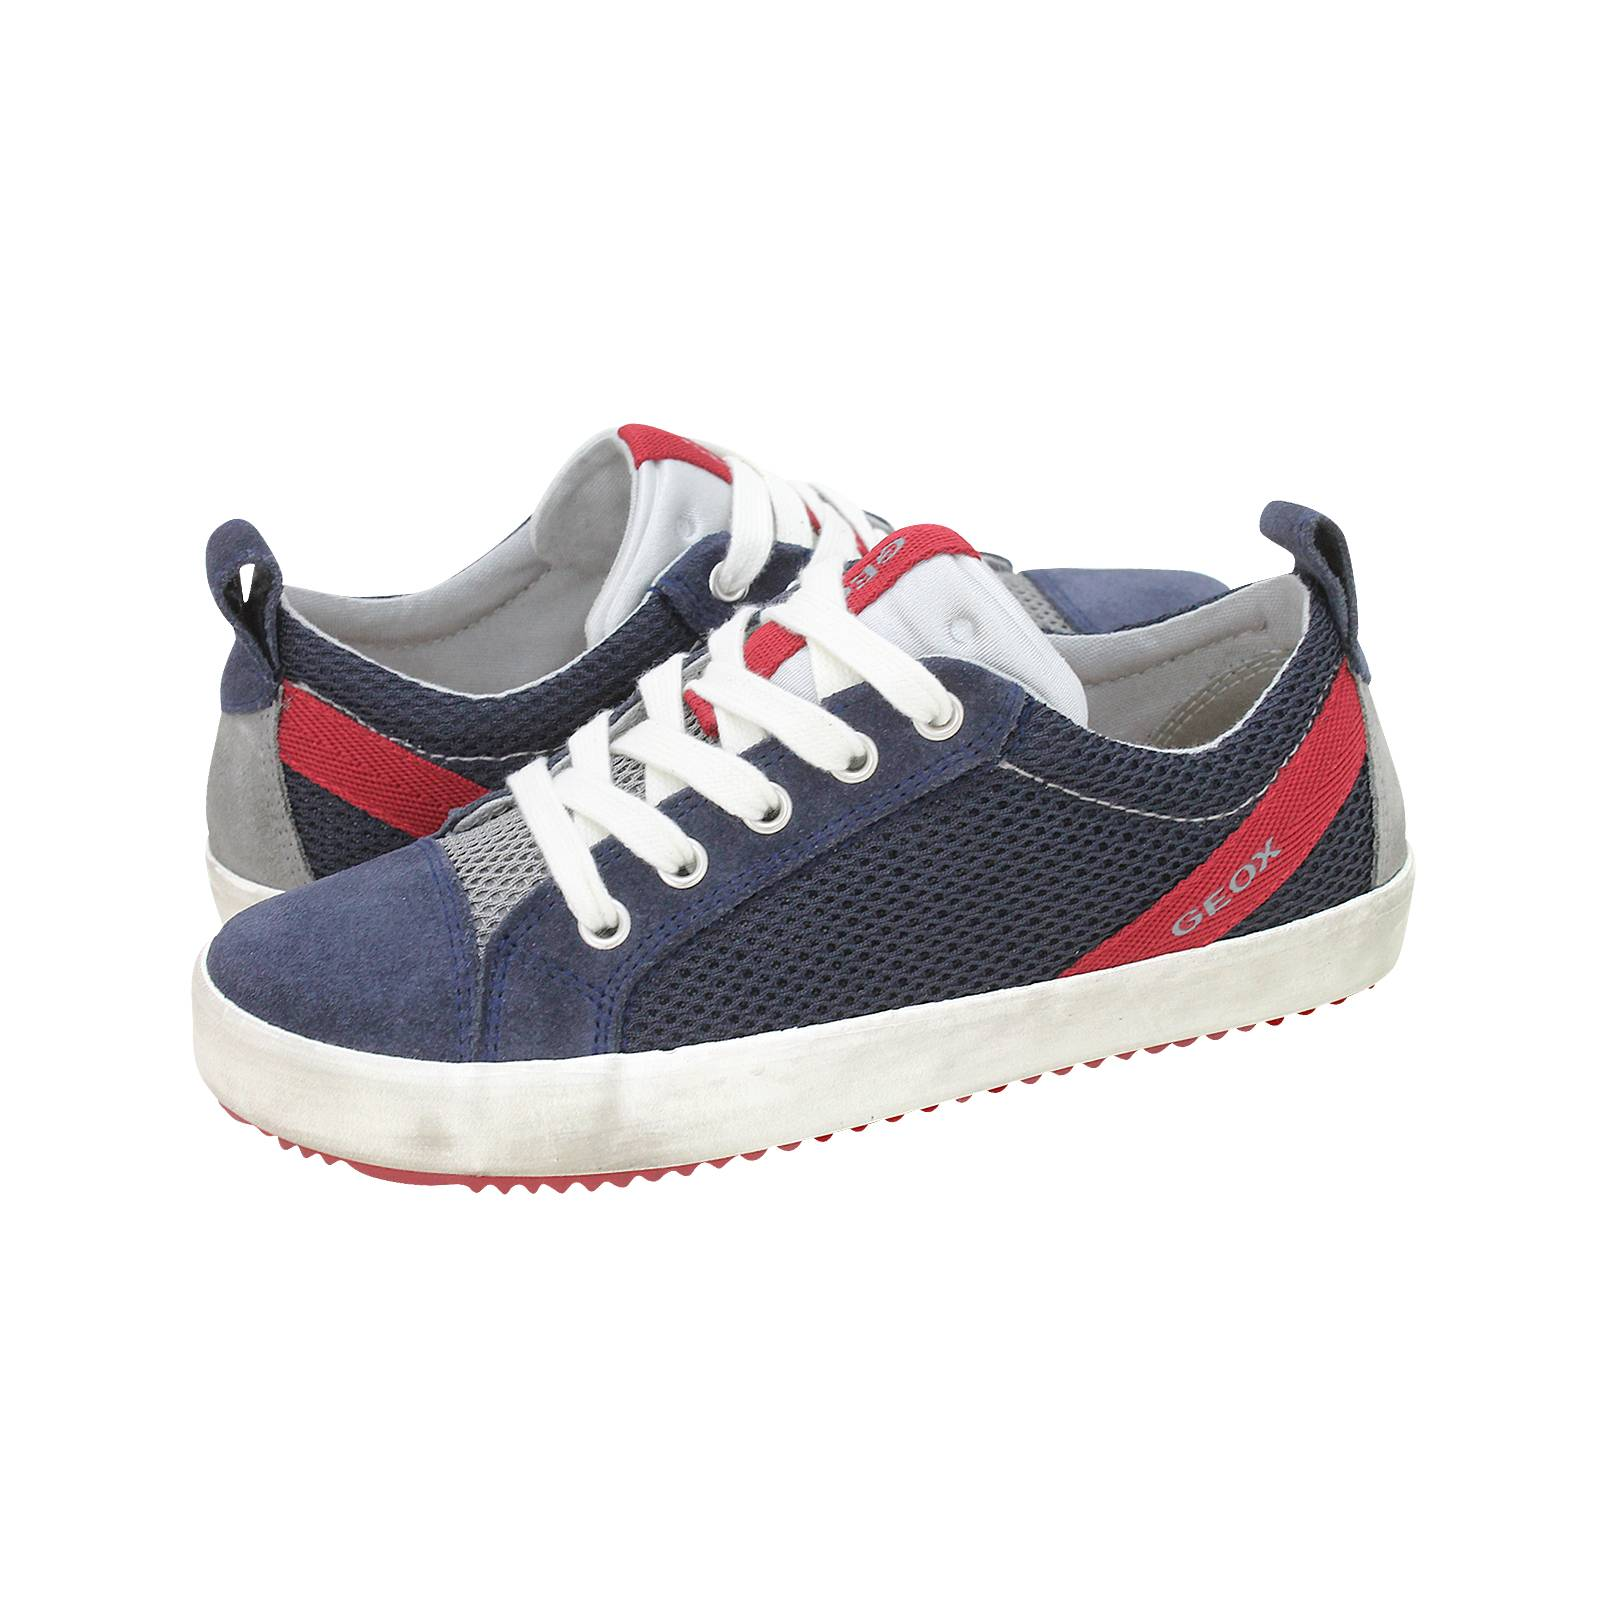 329fe92adf J Alonisso B - Παιδικά παπούτσια casual Geox από υφασμα και καστορι ...